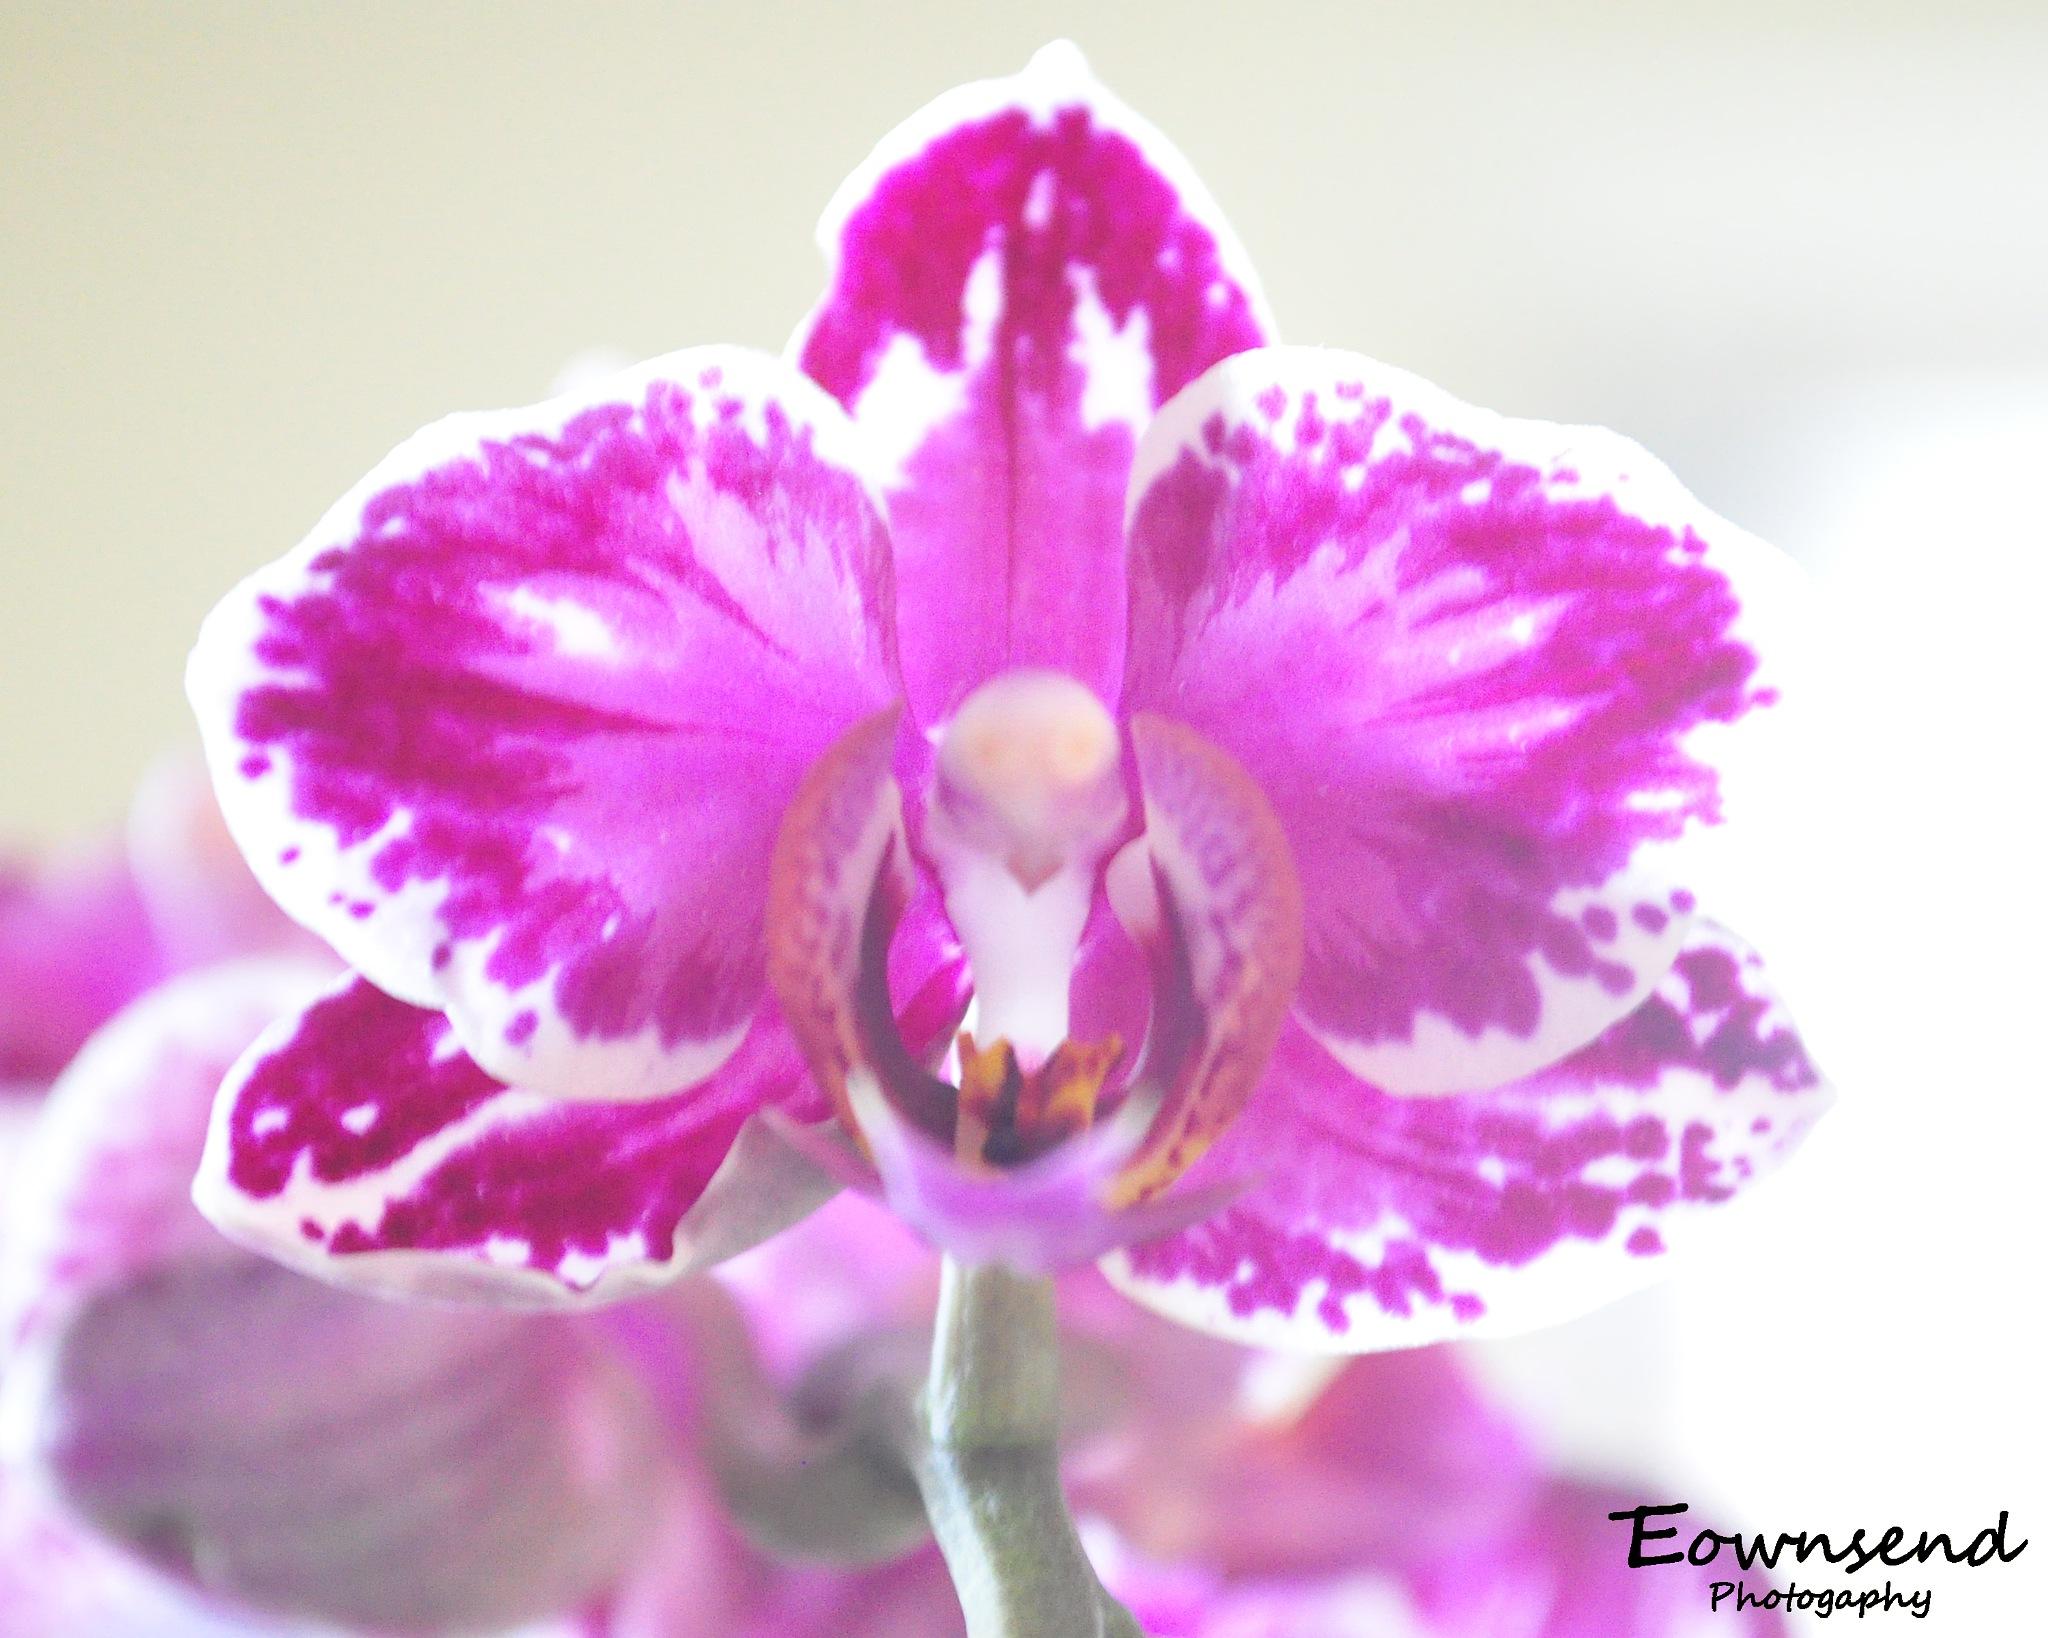 Orchid by Elizabeth C. Townsend